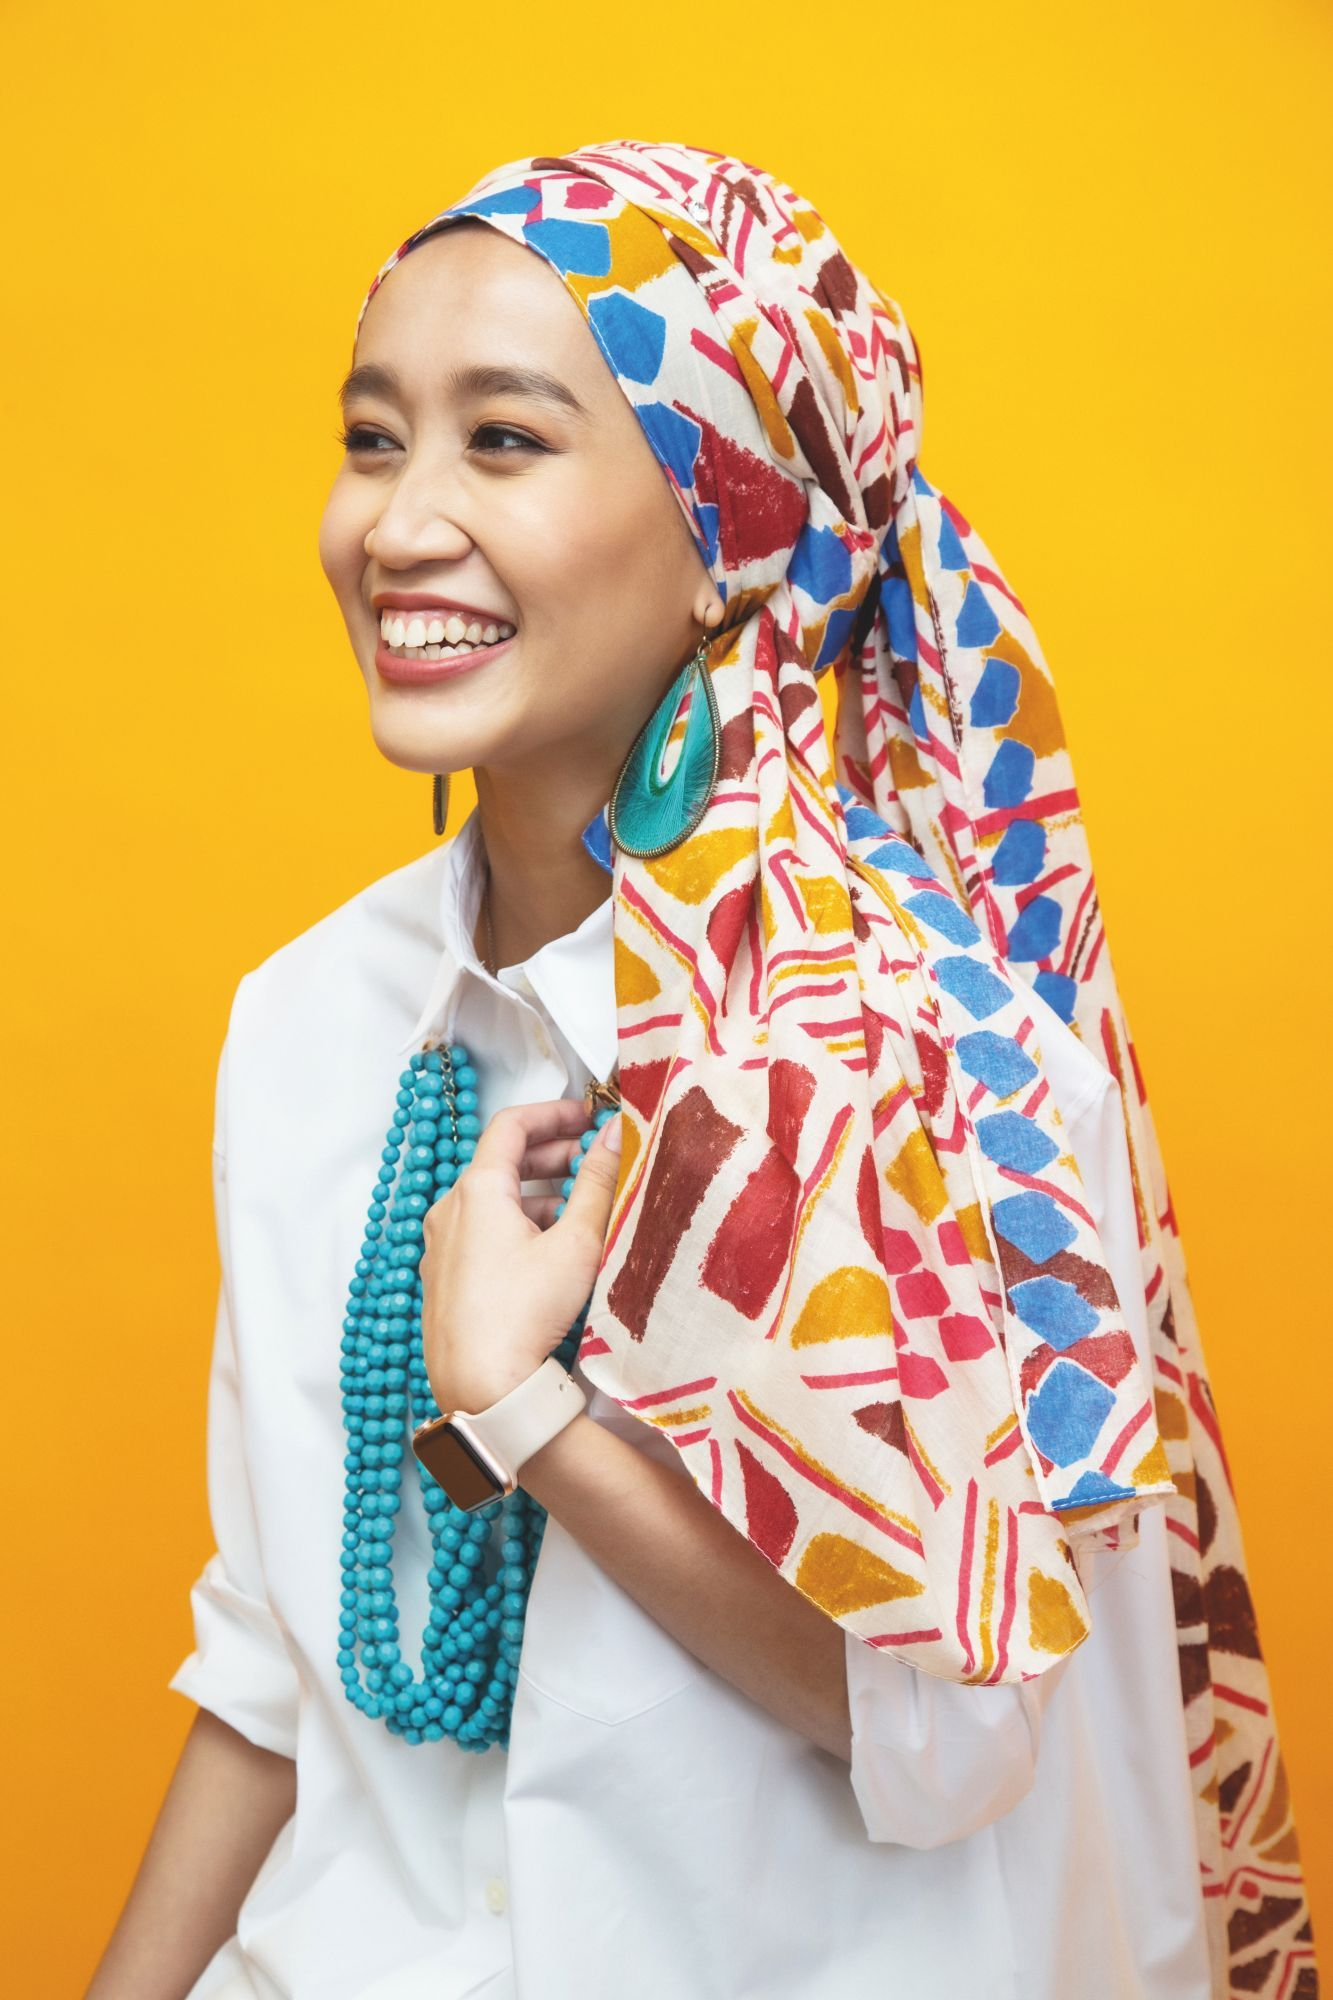 Photo: Khairul Imran/Generation T Asia